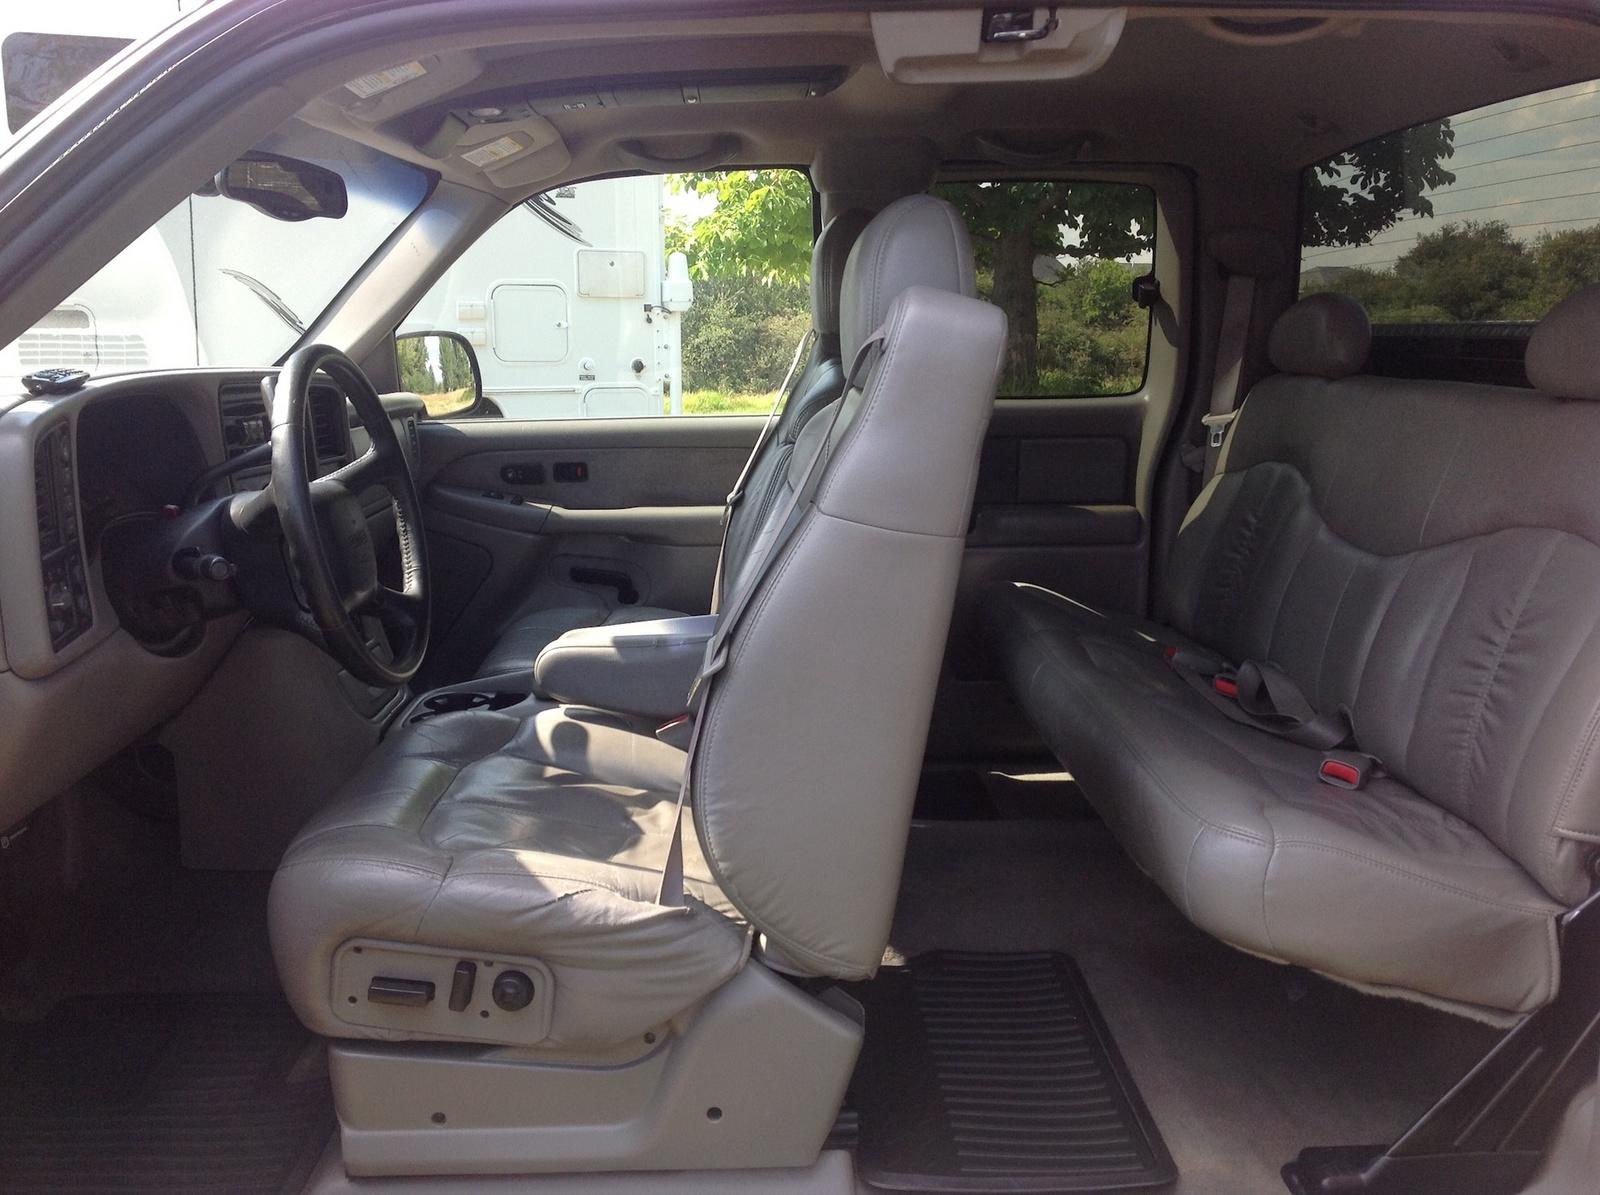 2003 Chevrolet Silverado 1500 Extended Cab >> 2001 GMC Sierra 1500 - Pictures - CarGurus